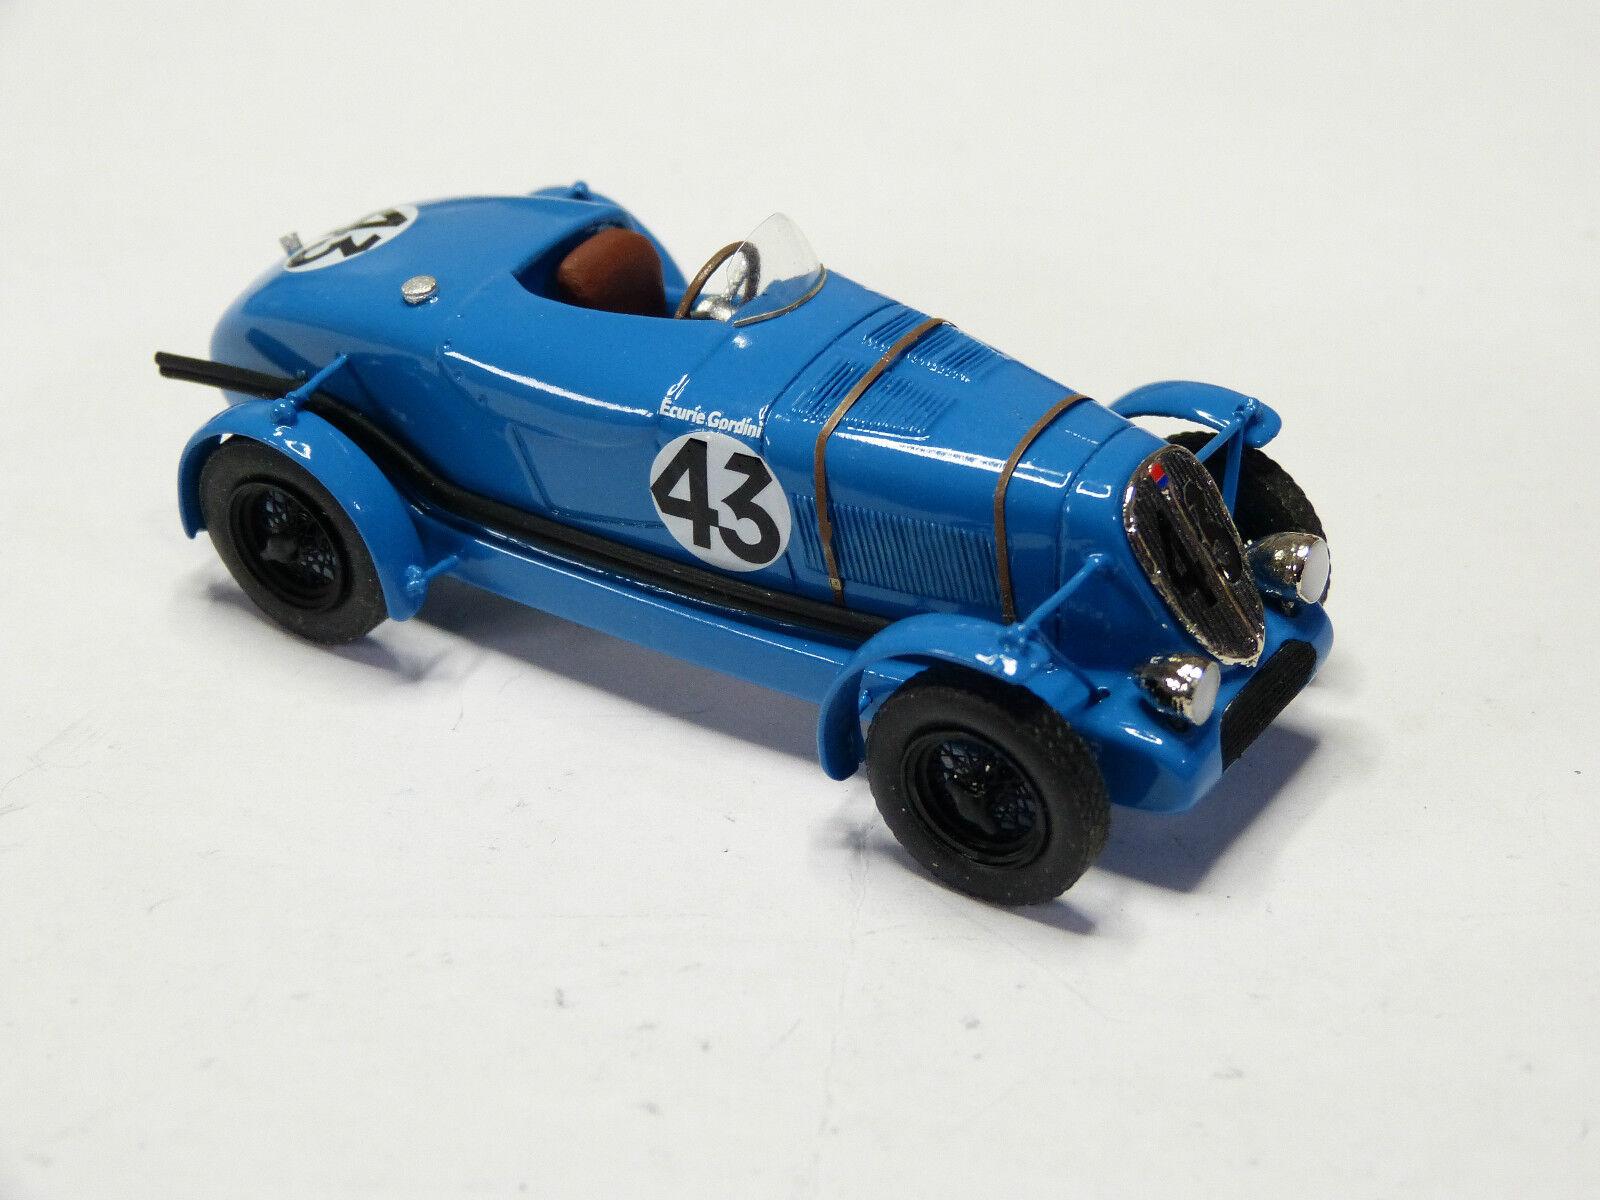 Kit for miniature auto ccc  simca fiat balilla le mans 1937-1938 ref 205